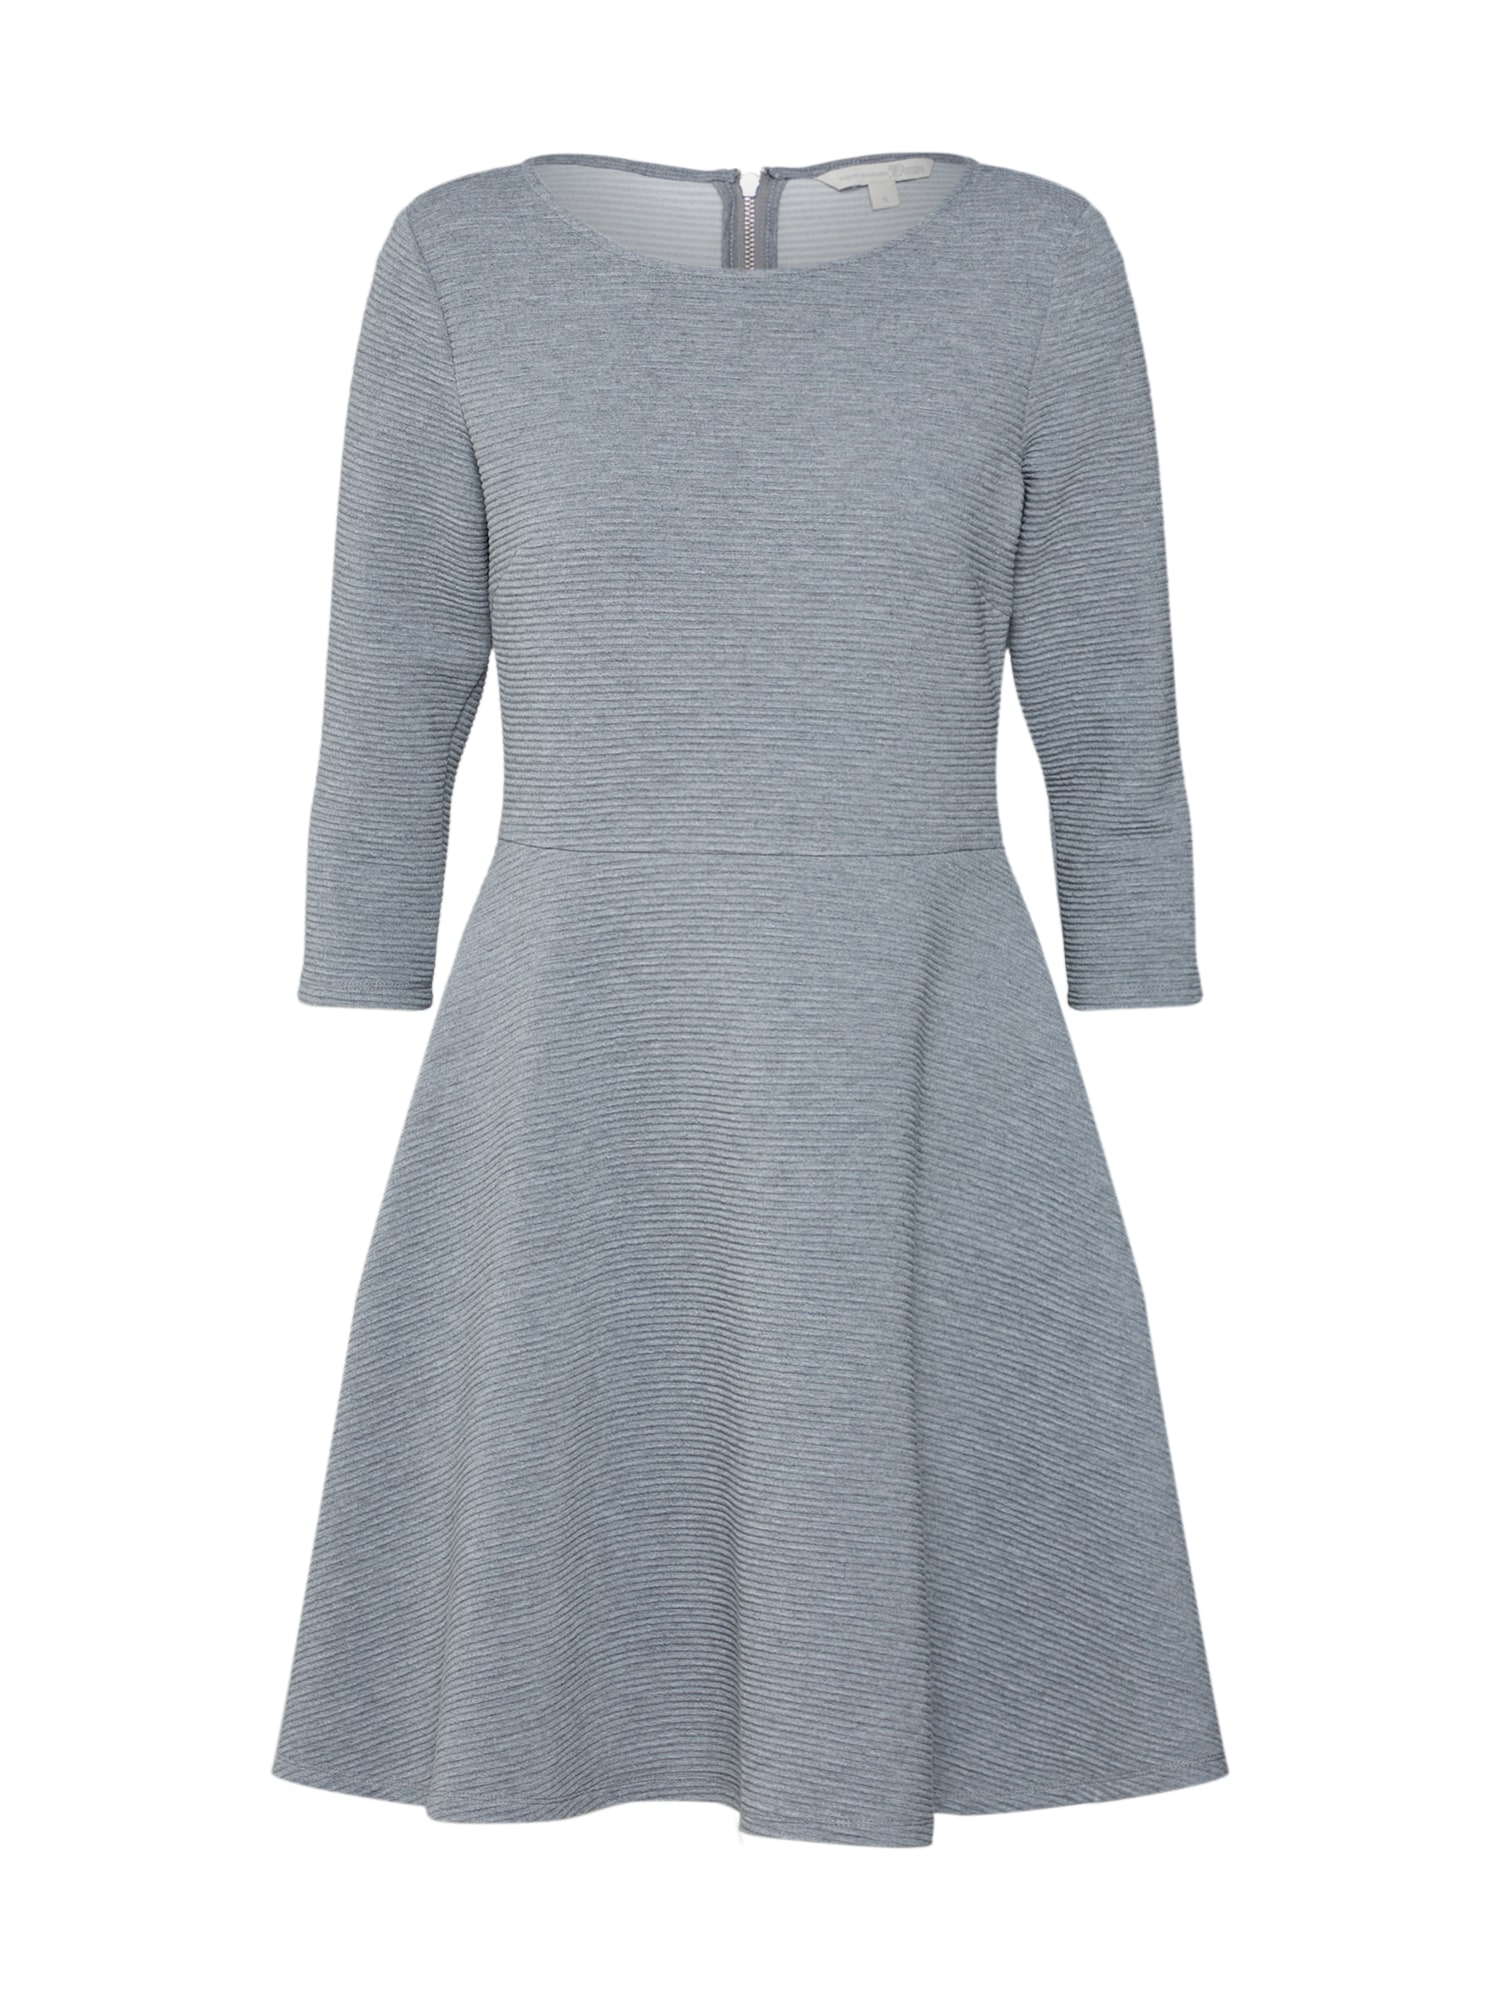 Šaty stříbrně šedá TOM TAILOR DENIM